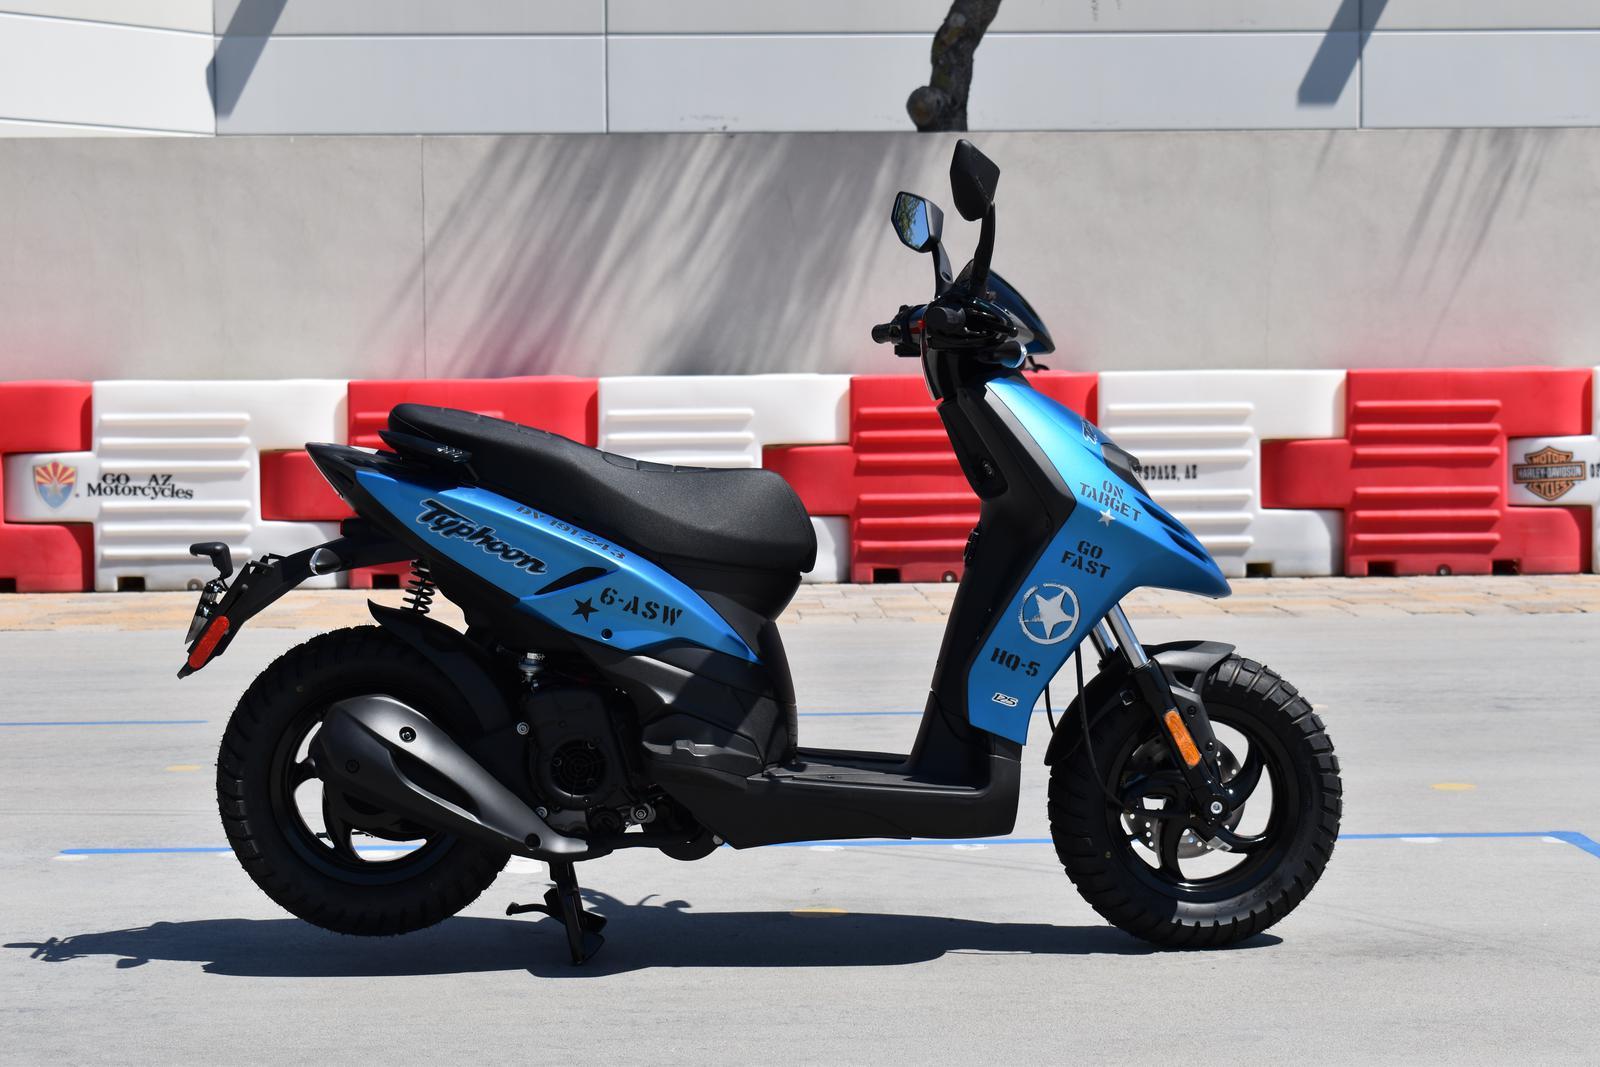 STARTER MOTOR FOR PIAGGIO TYPHOON 50 CLEARANCE SALE